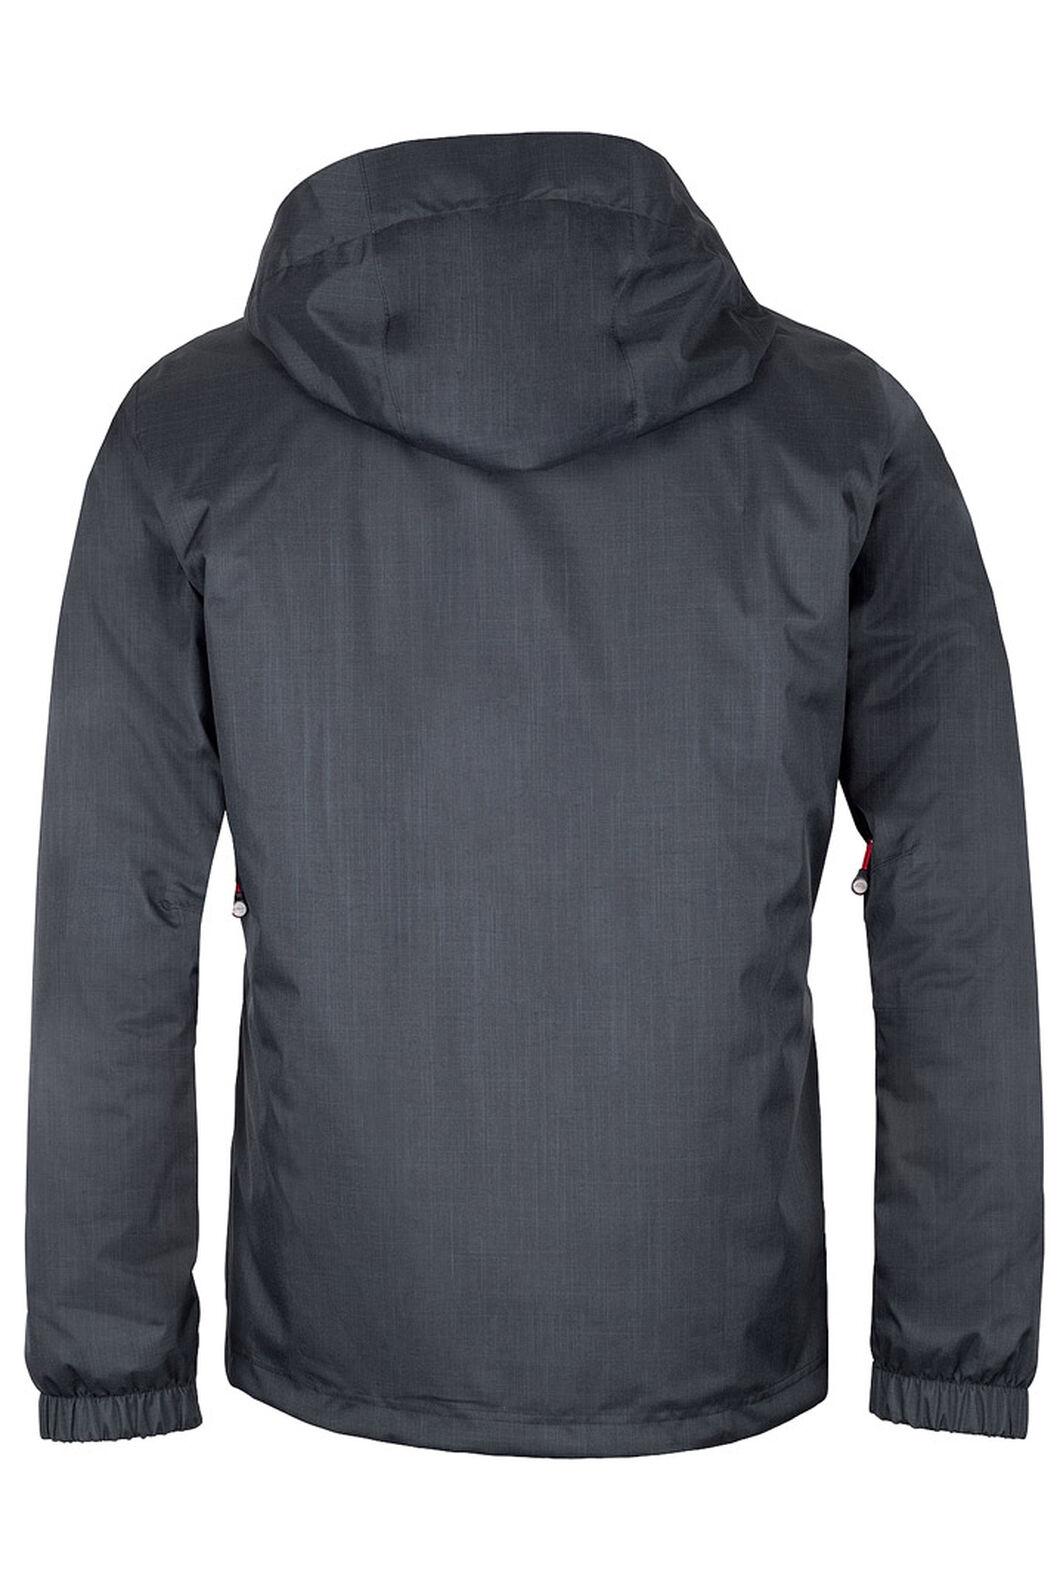 Images. Macpac Powder Ski Jacket - Men s ... bb79d9e3d